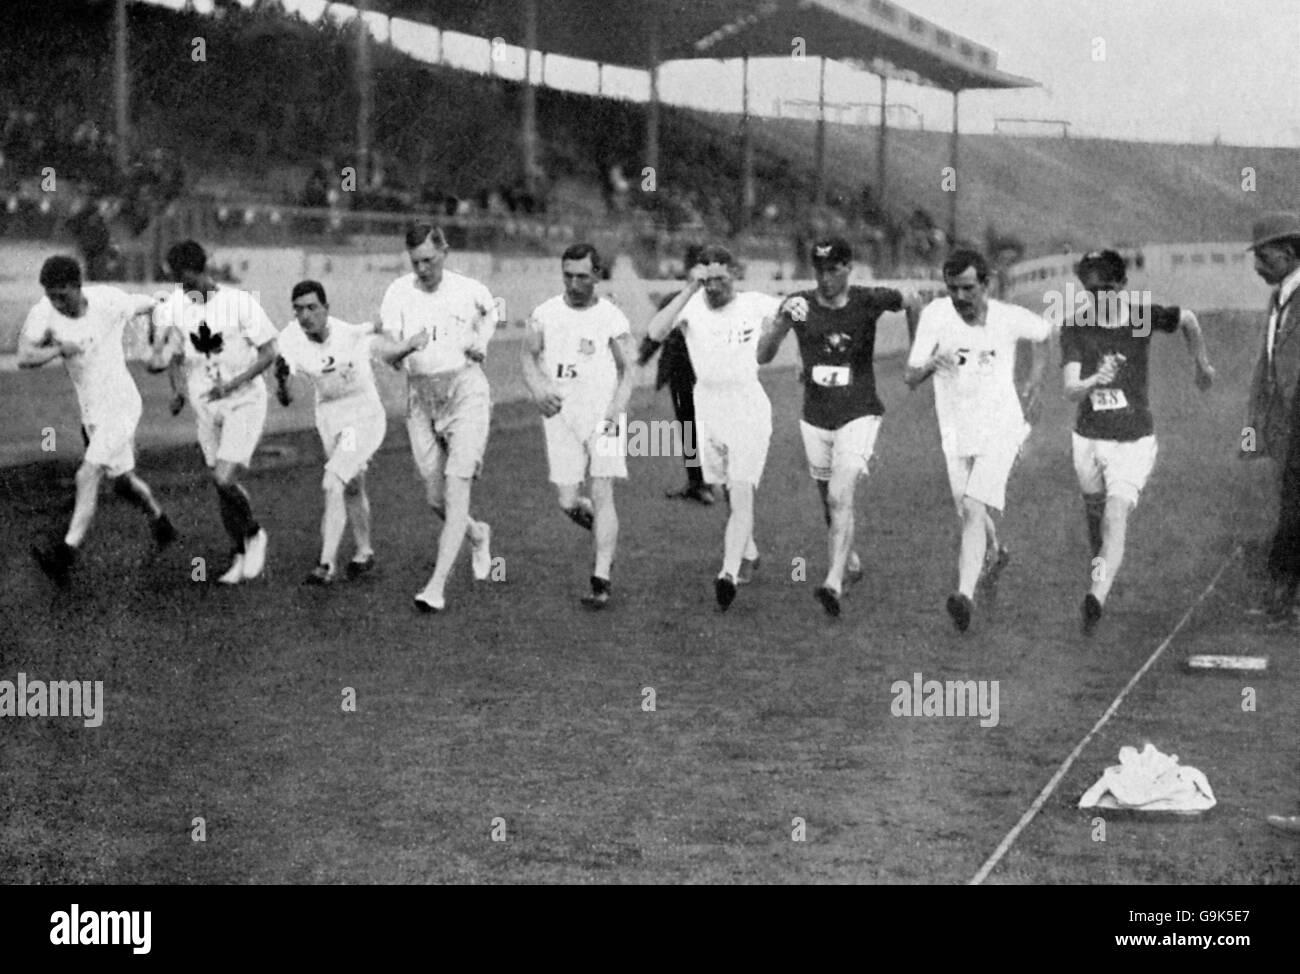 Athletics - London Olympic Games 1908 - 3500m Walk - White City - Stock Image